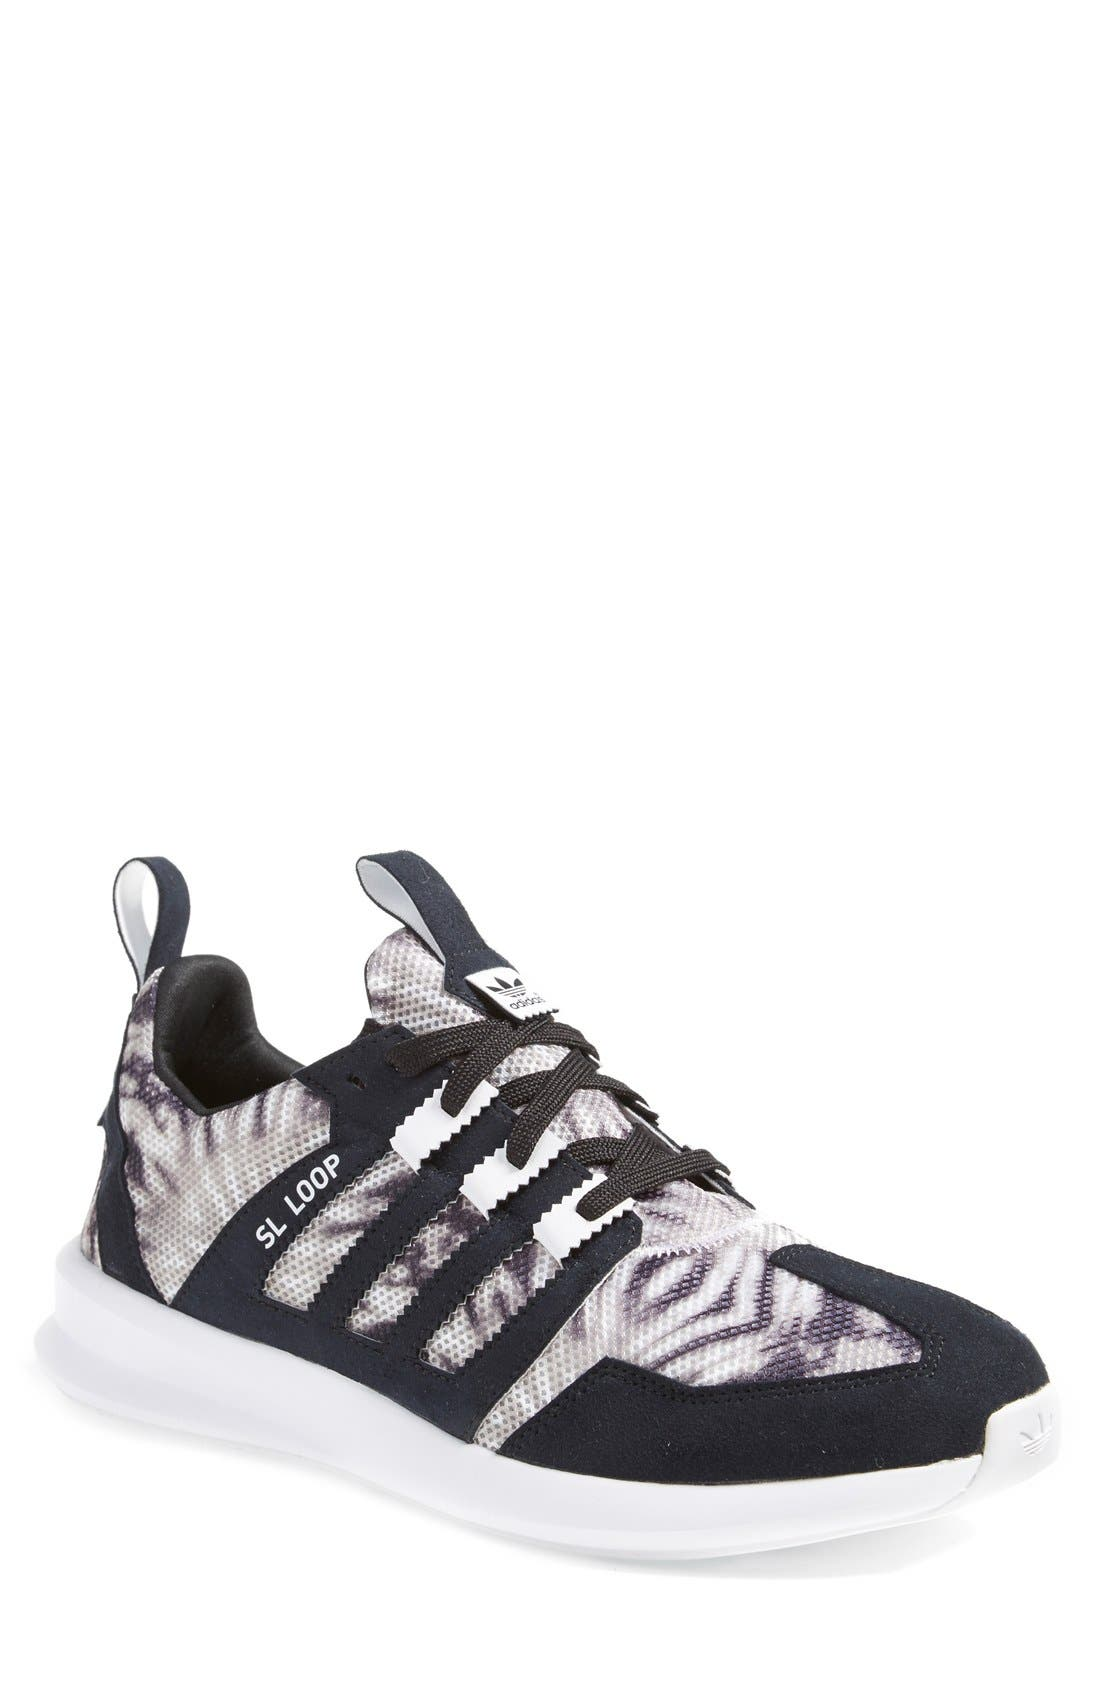 ADIDAS 'SL Loop Runner' Sneaker, Main, color, 001